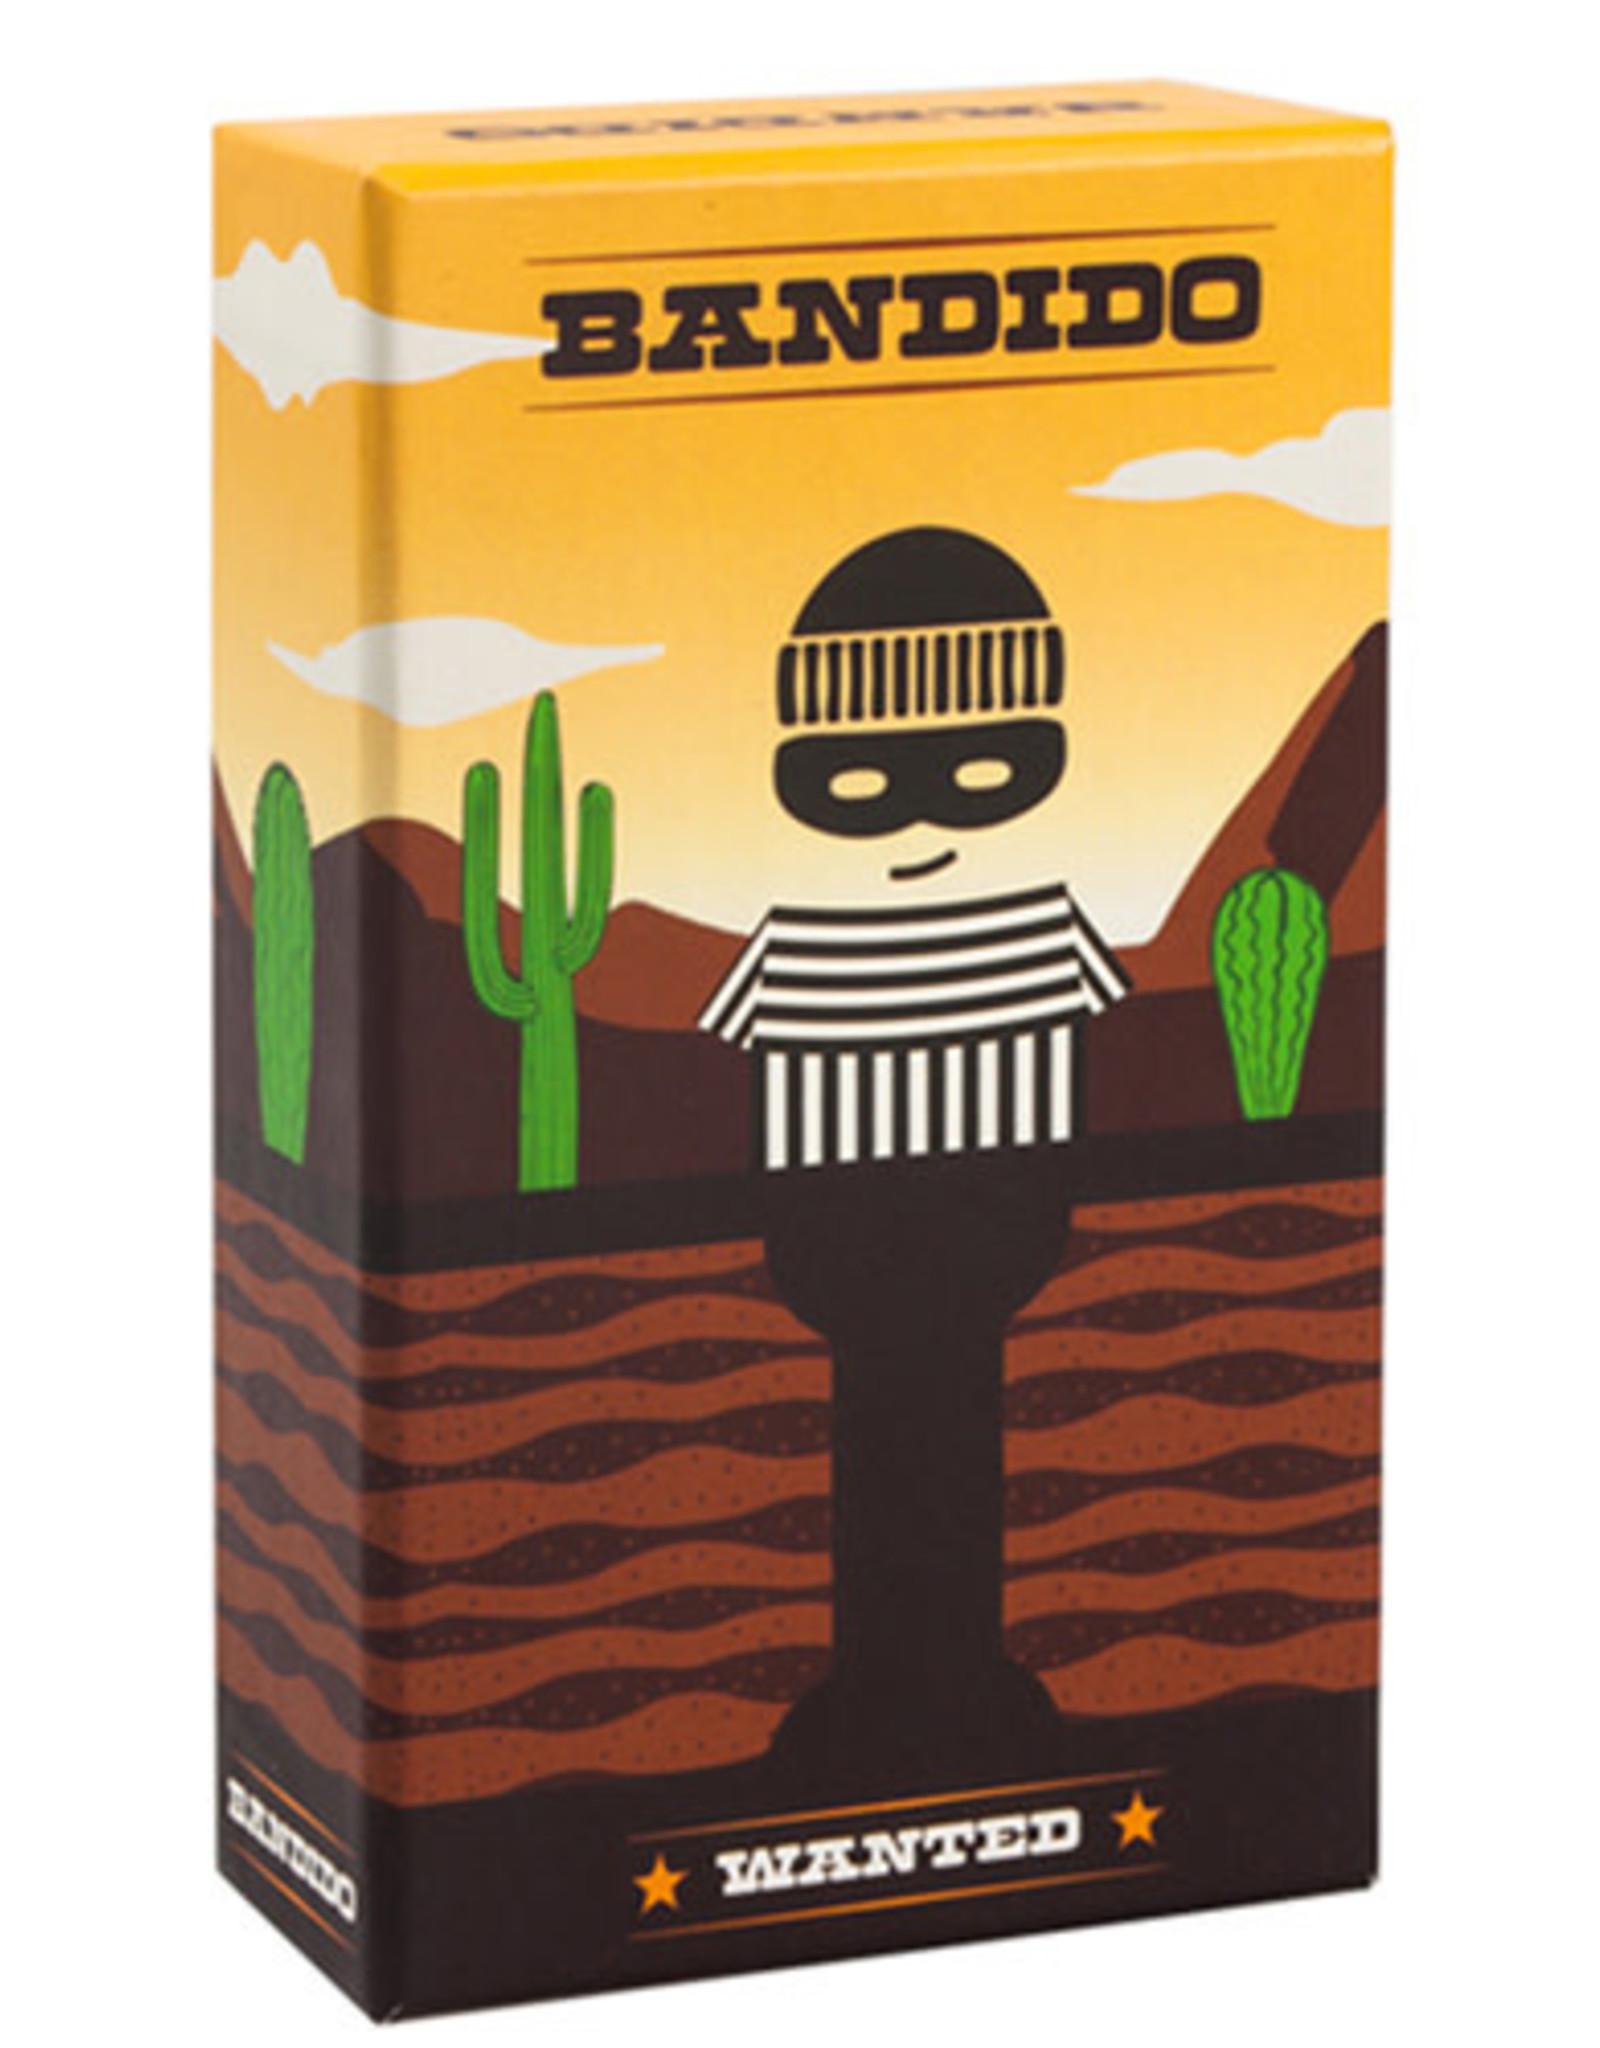 Helvetiq Bandido Game